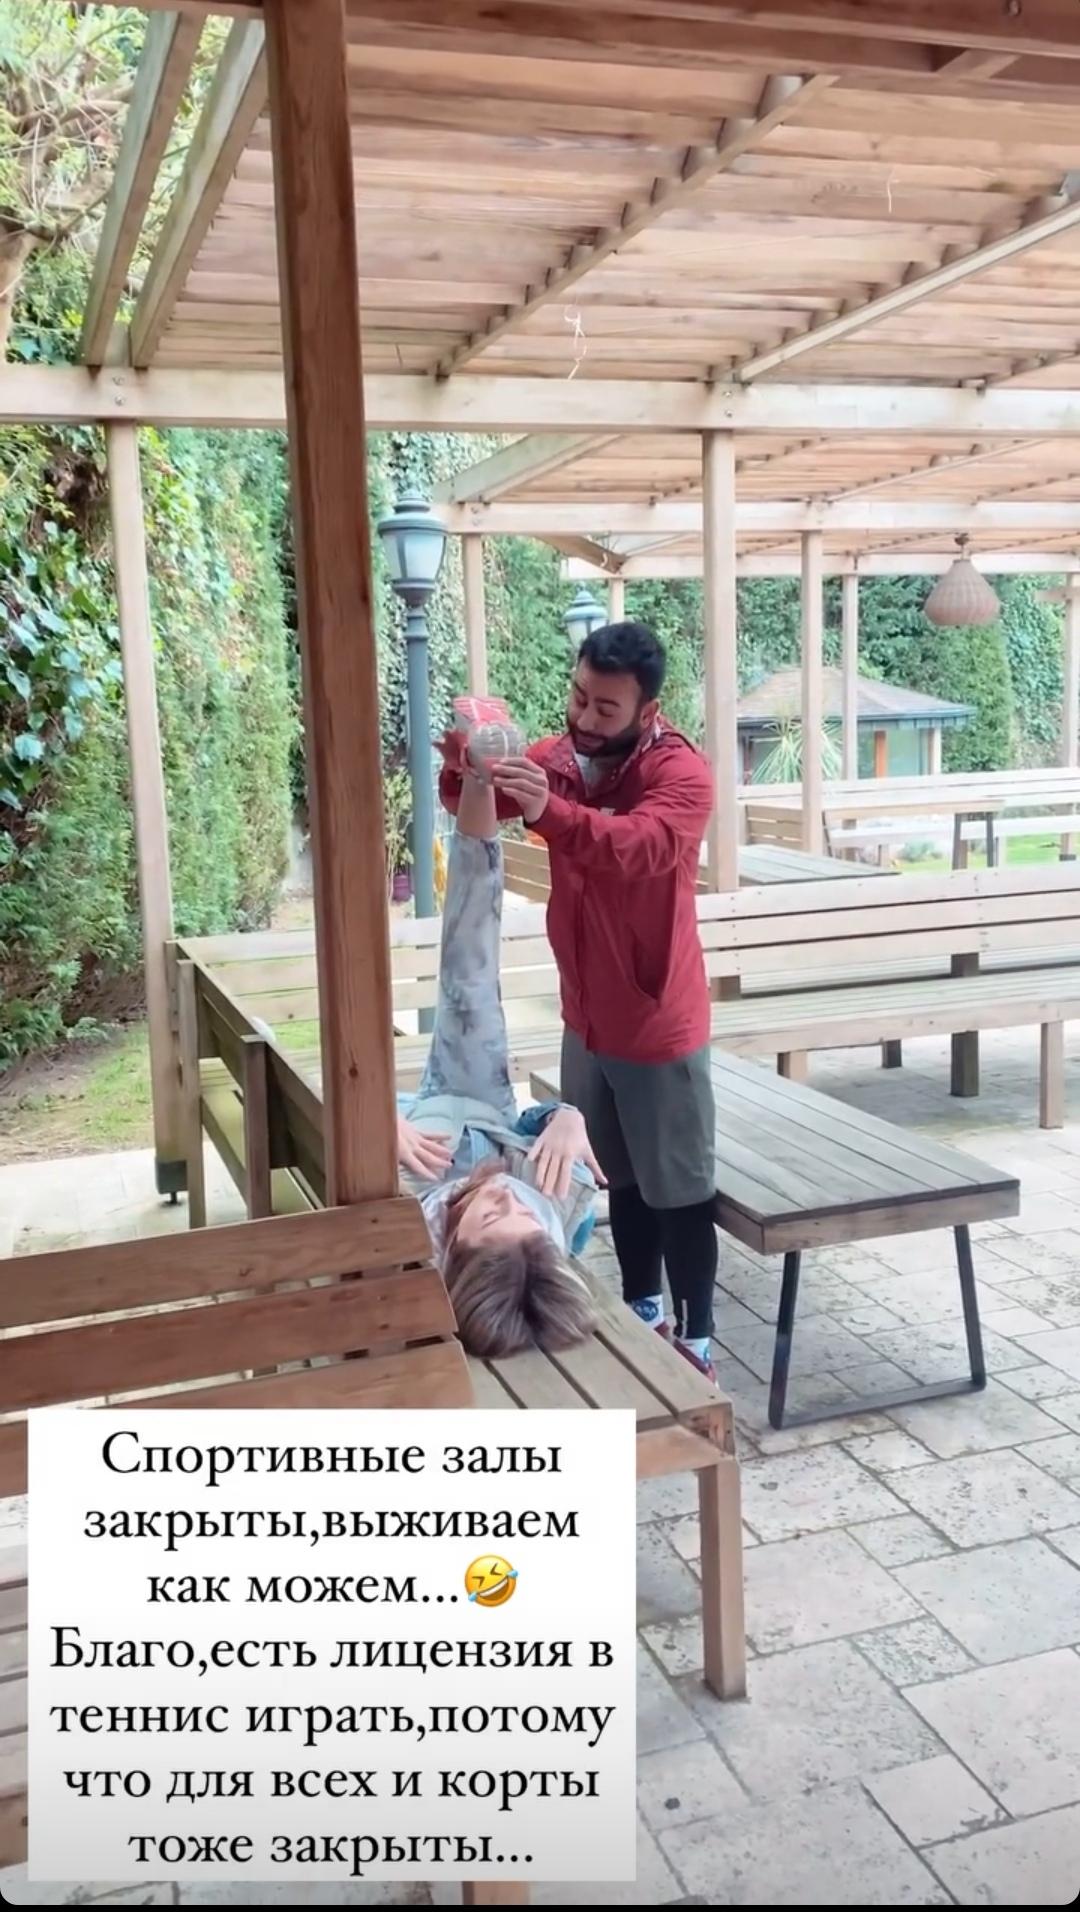 Screenshot_20210426_123006_com.instagram.android_edit_65121320457250.jpg